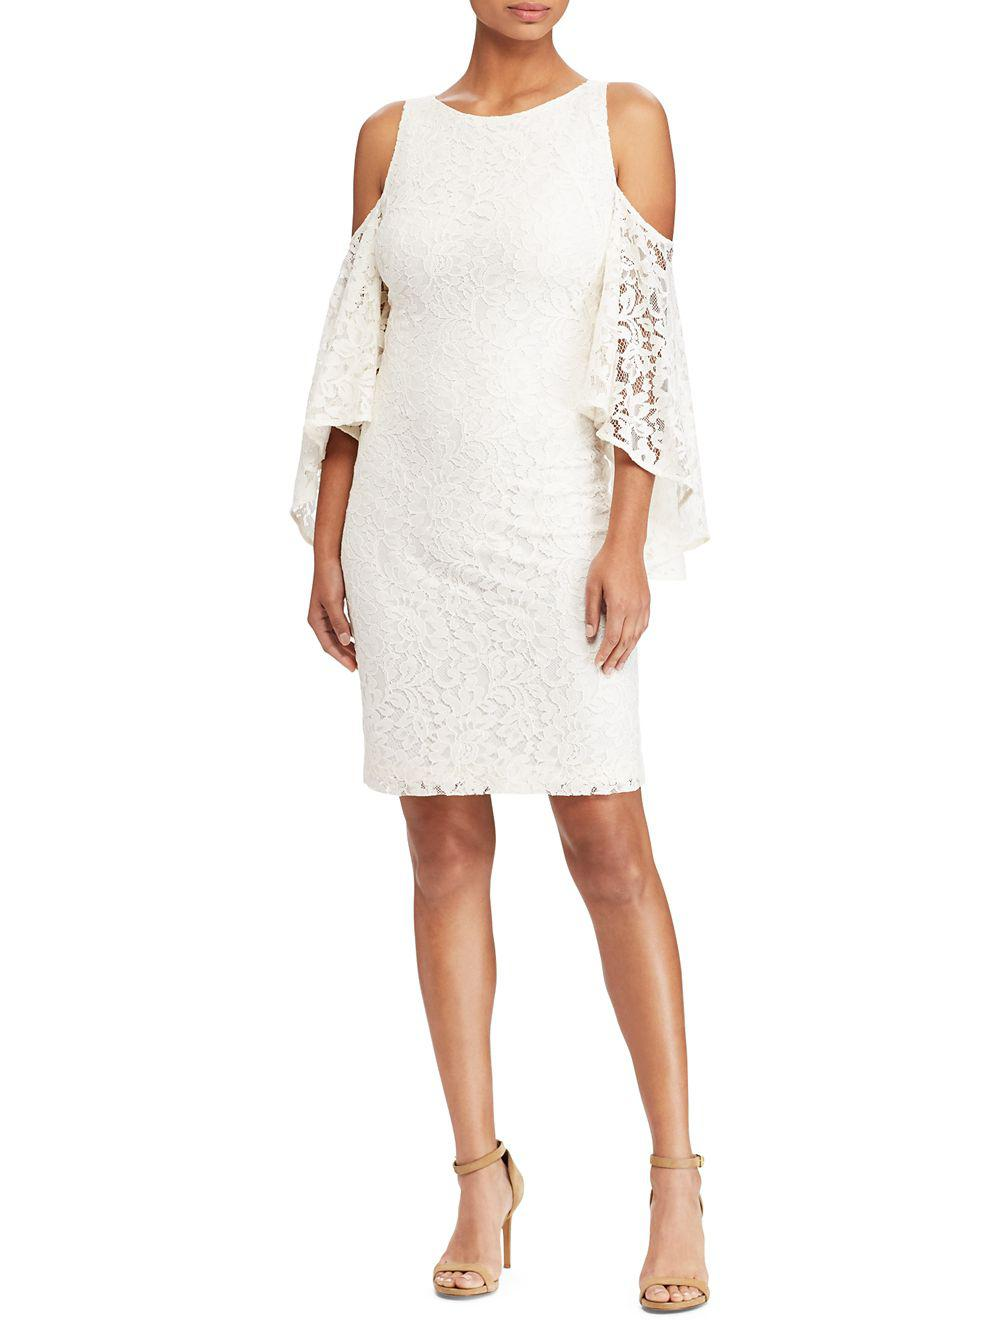 7057838a256 Lyst - Lauren By Ralph Lauren Crepe Bell-sleeve Dress in White